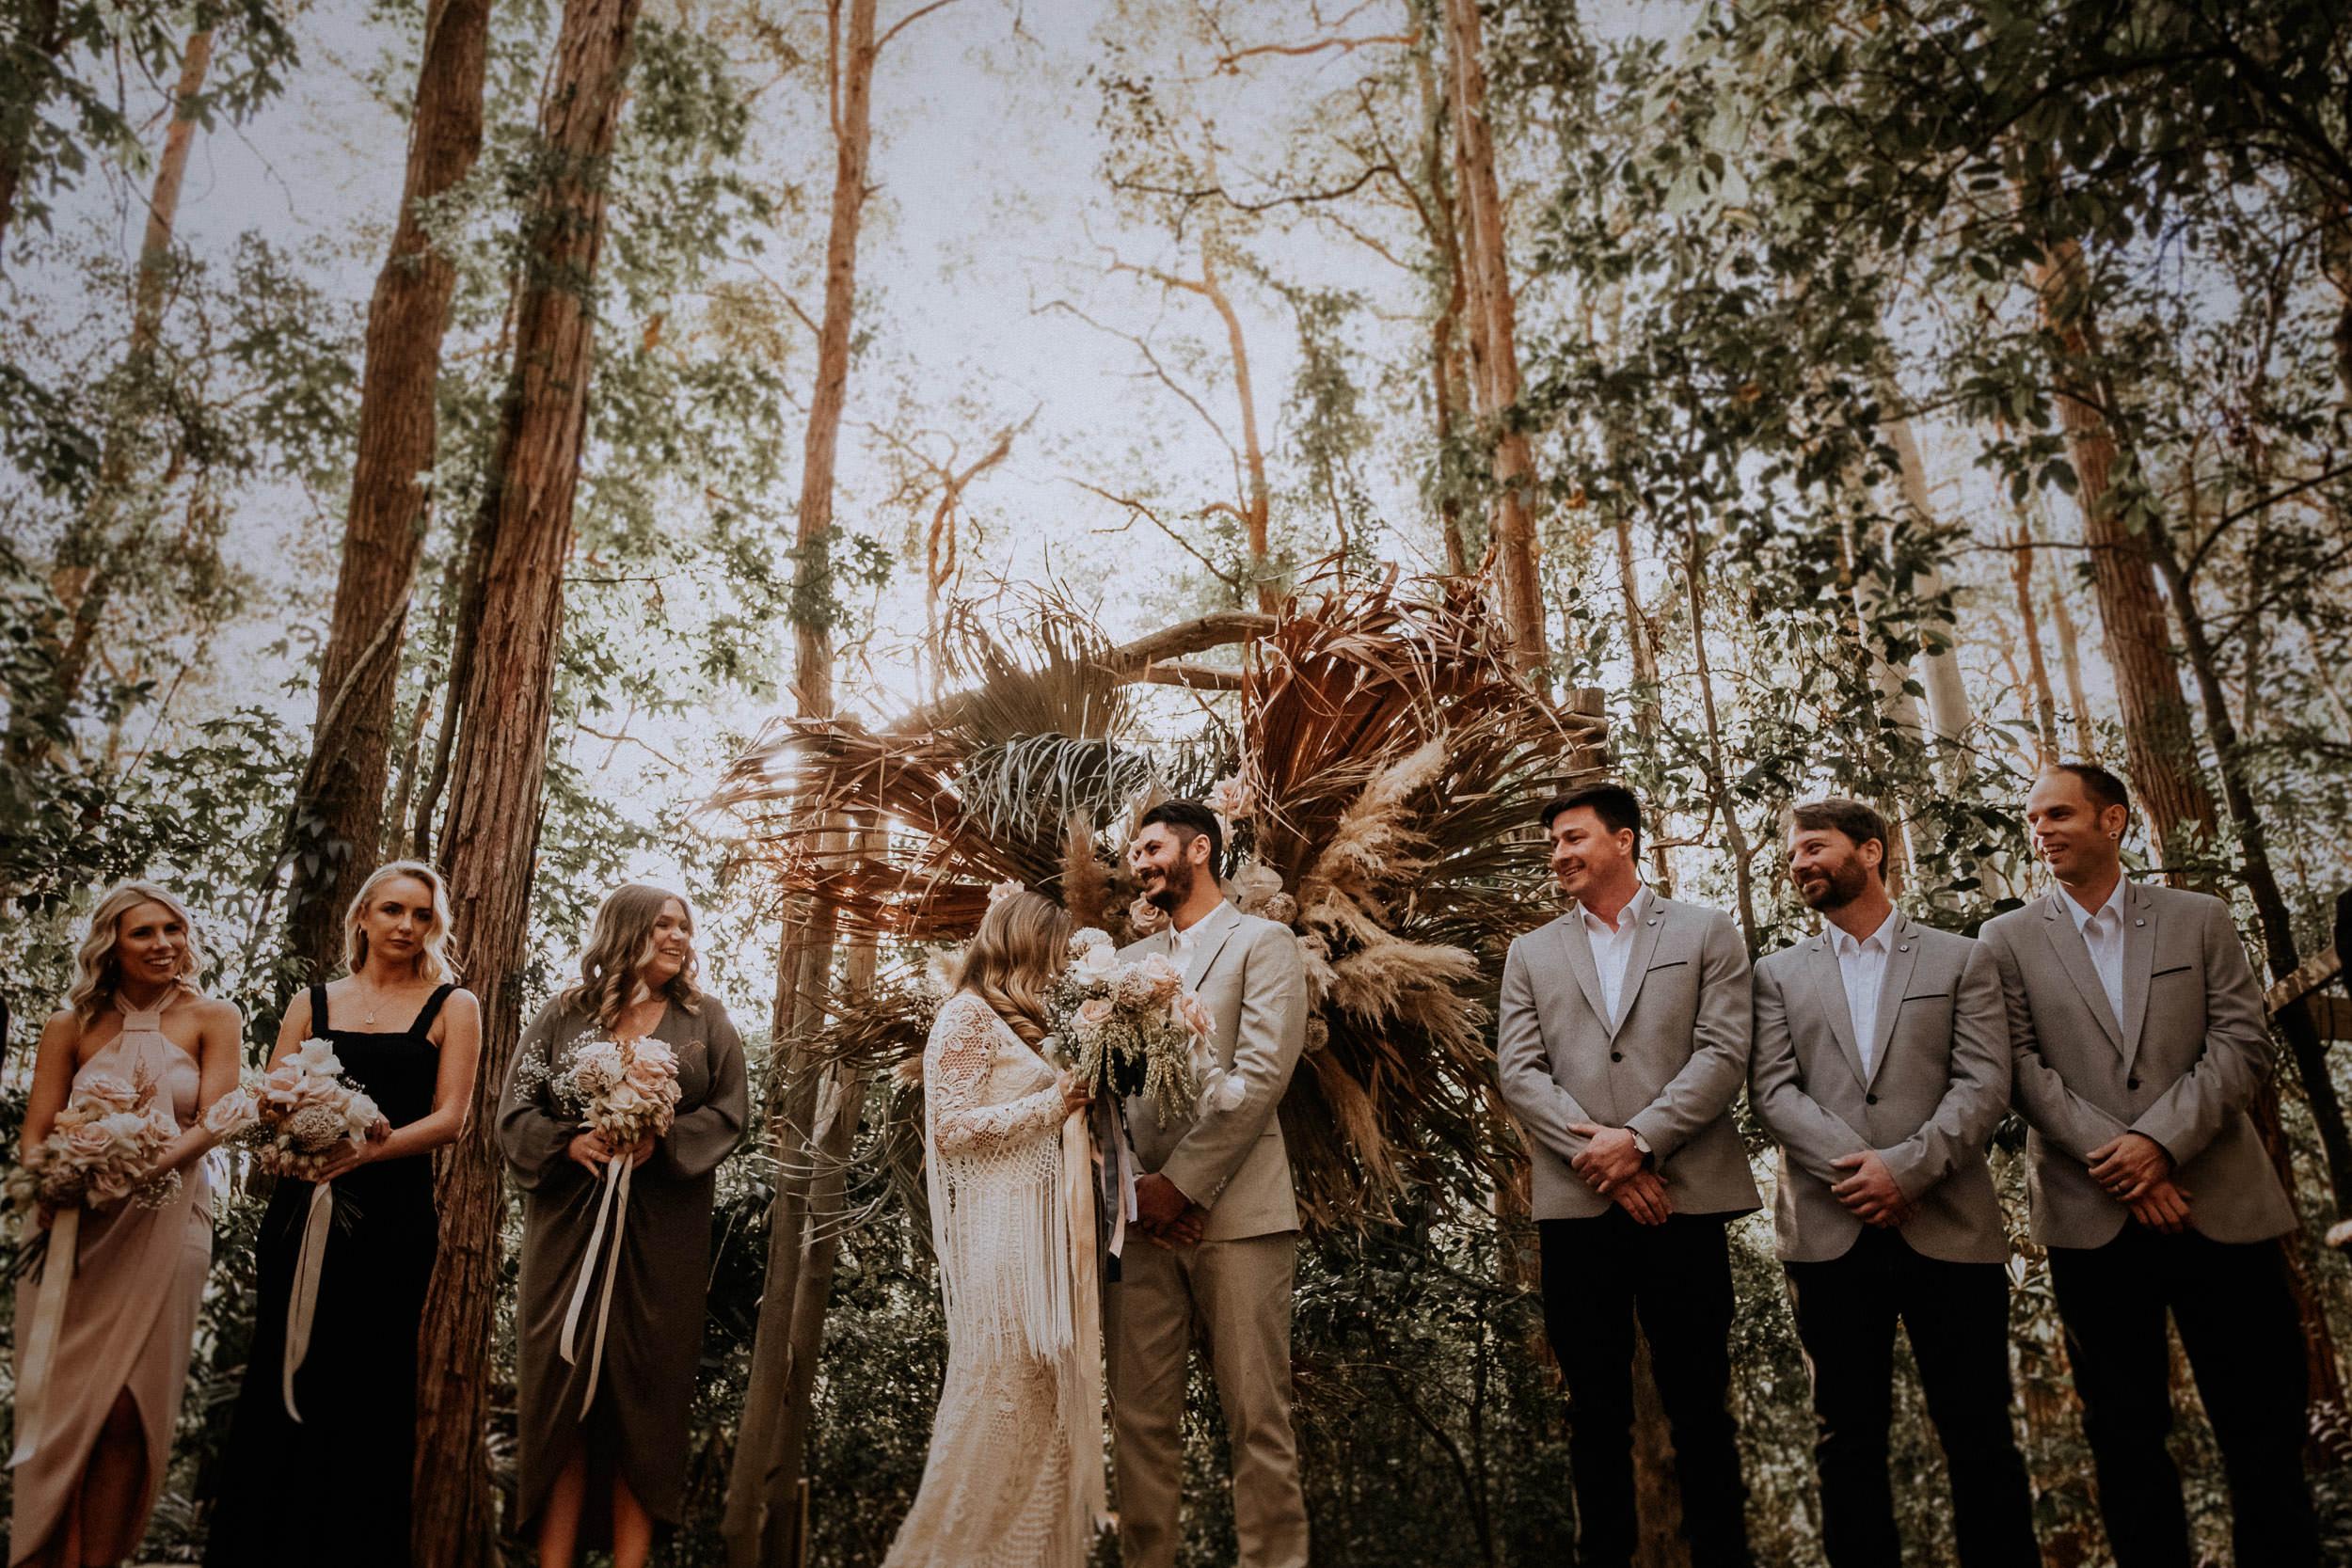 S&A Elopement - Kings & Thieves - Shred 'Til Dead - Central Coast Beach Forest Wedding - 259.jpg